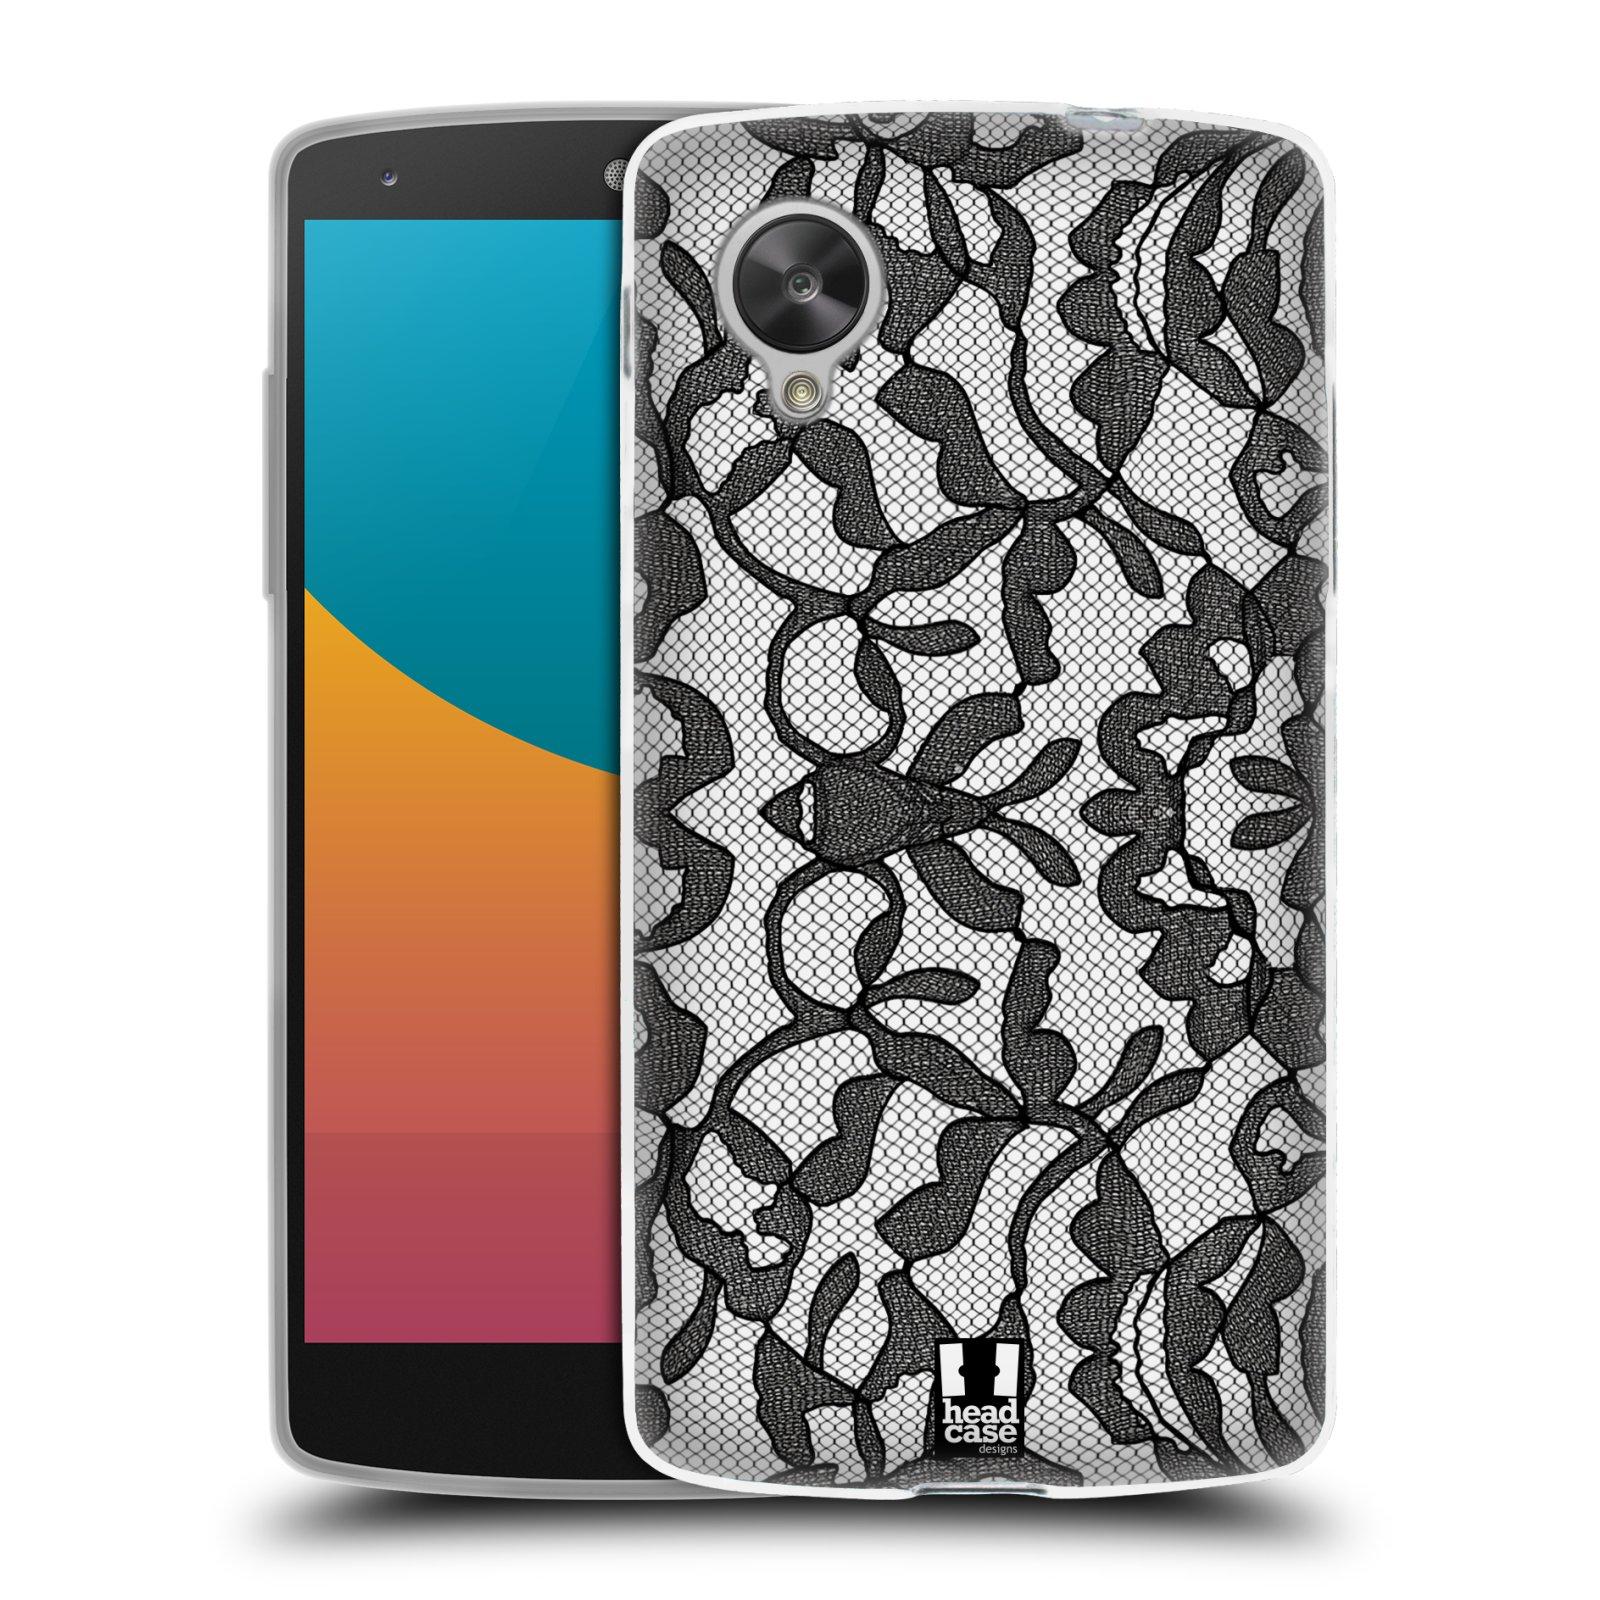 Silikonové pouzdro na mobil LG Nexus 5 HEAD CASE LEAFY KRAJKA (Silikonový kryt či obal na mobilní telefon LG Google Nexus 5 D821)